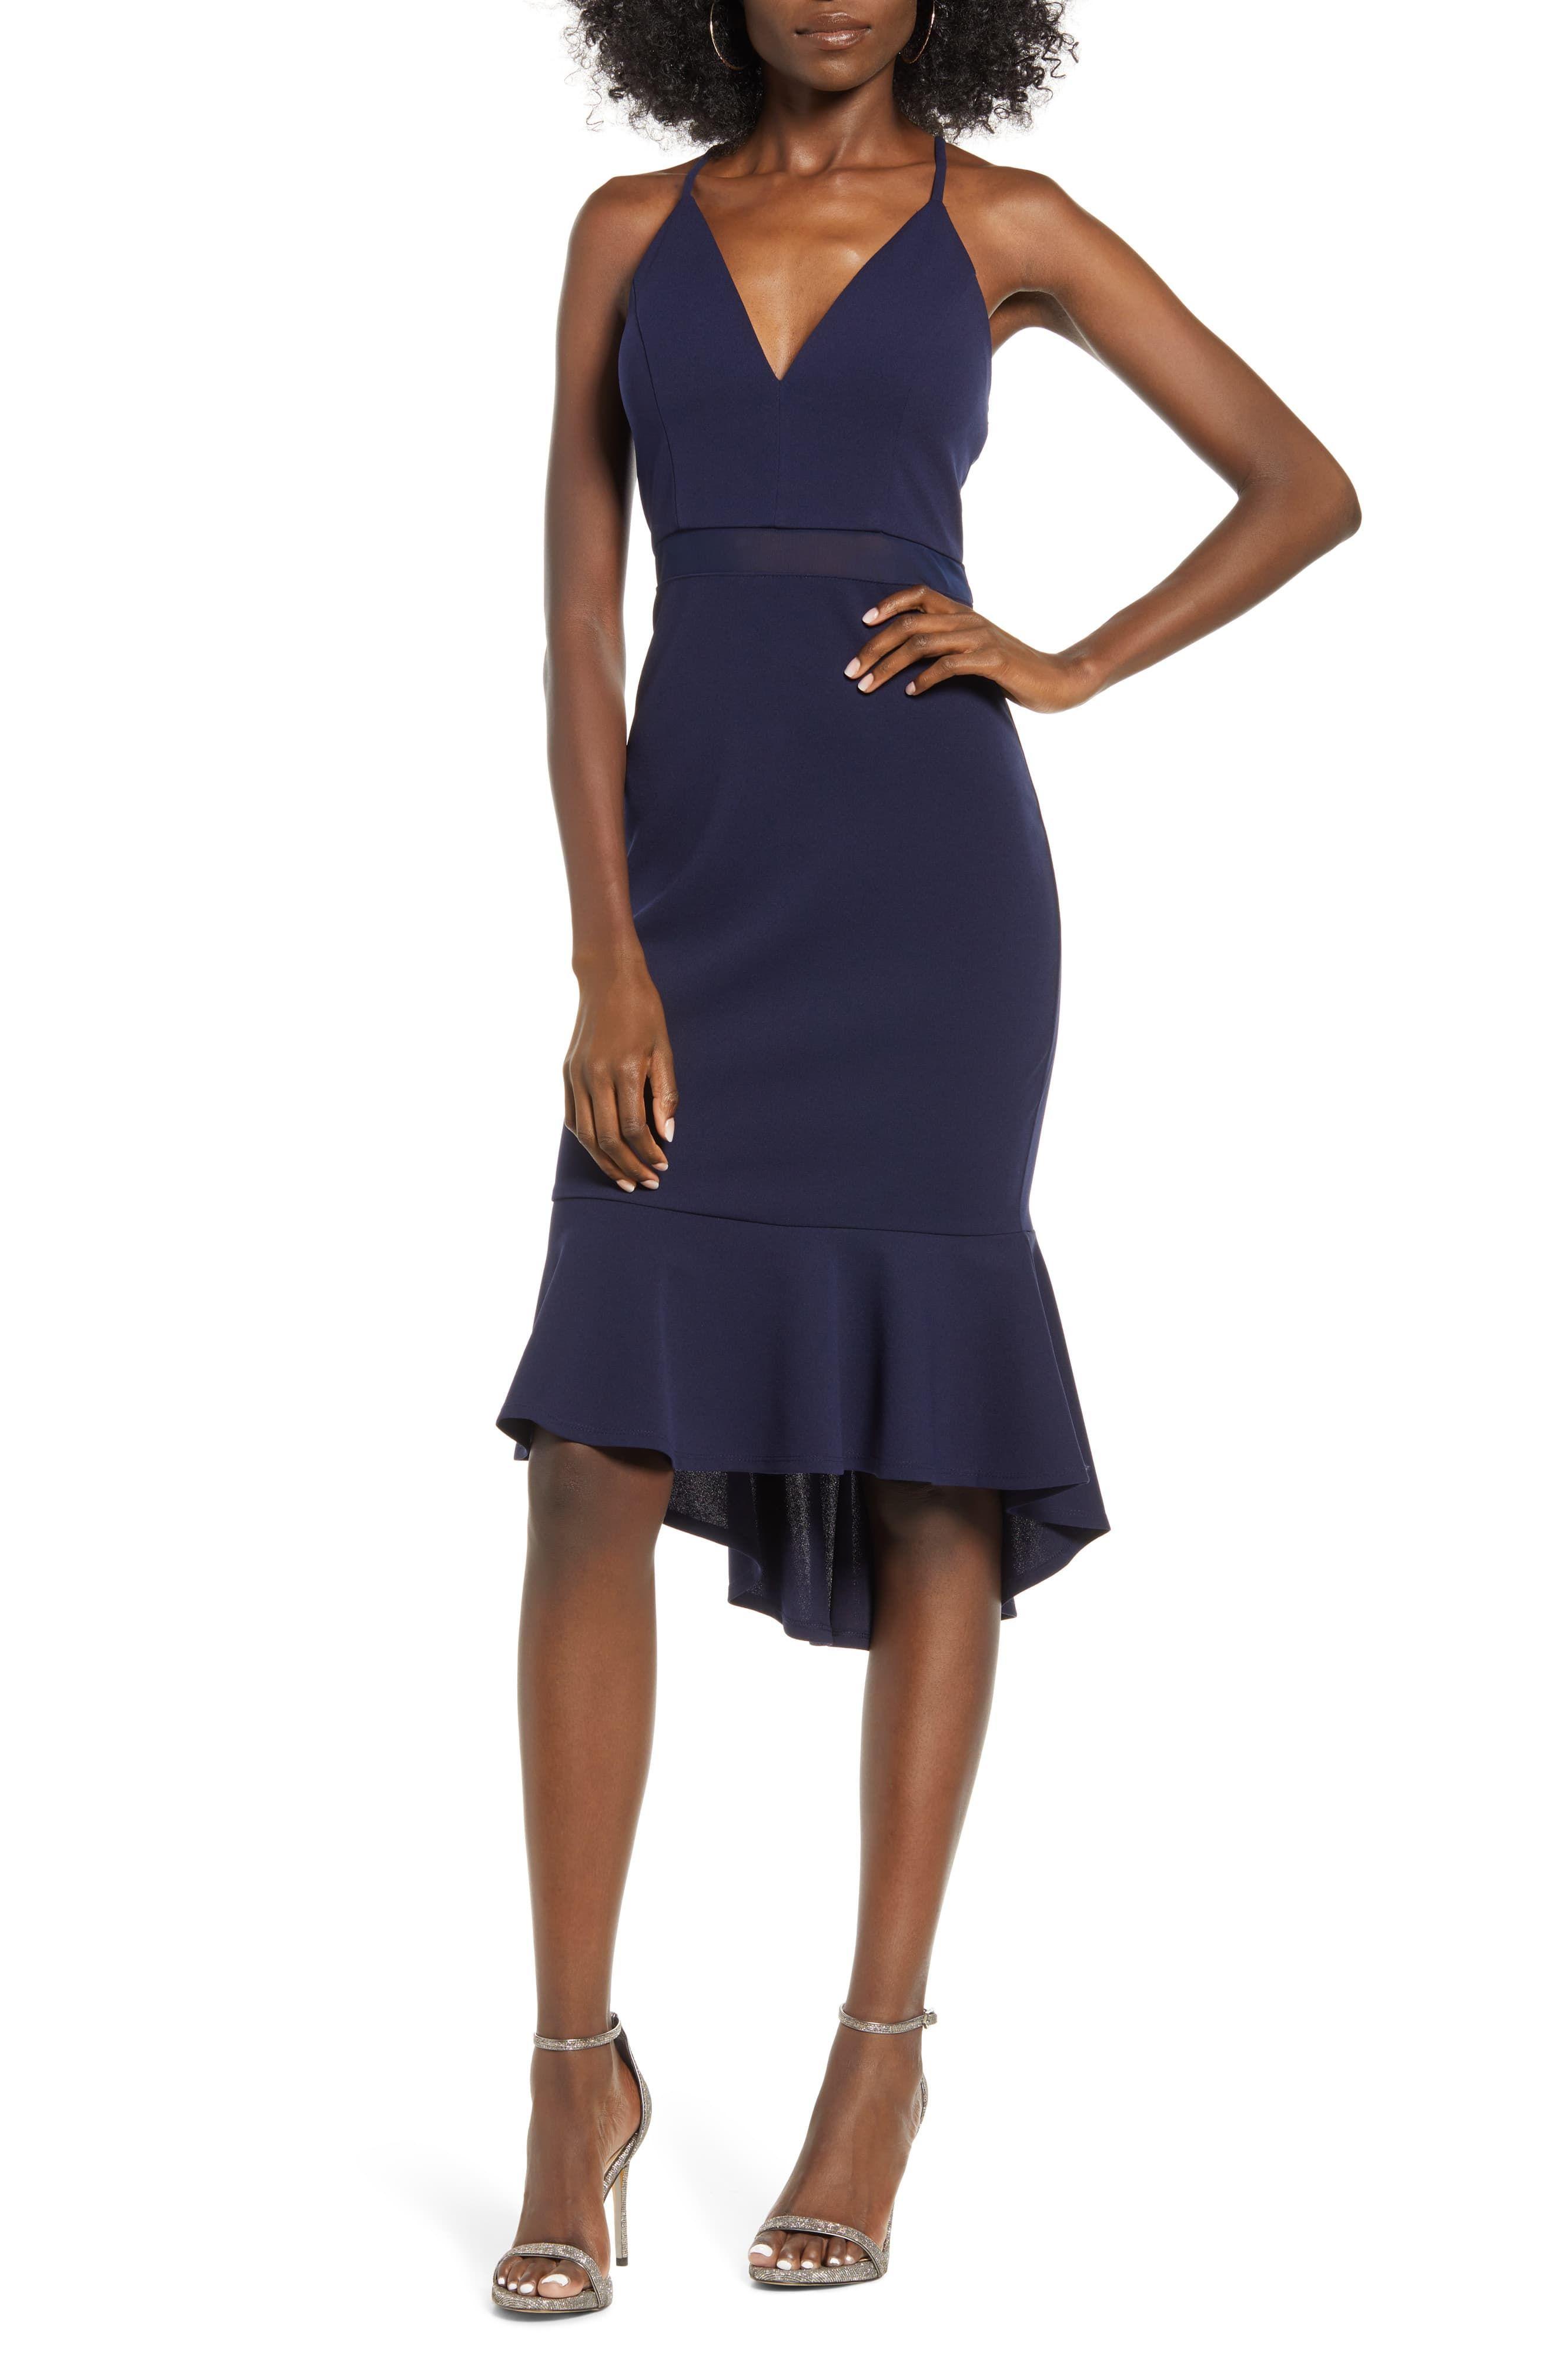 Love Nicki Lew Illusion Detail Flounce Dress Nordstrom Cocktail Dress Classy Flounced Dress Dresses [ 4048 x 2640 Pixel ]